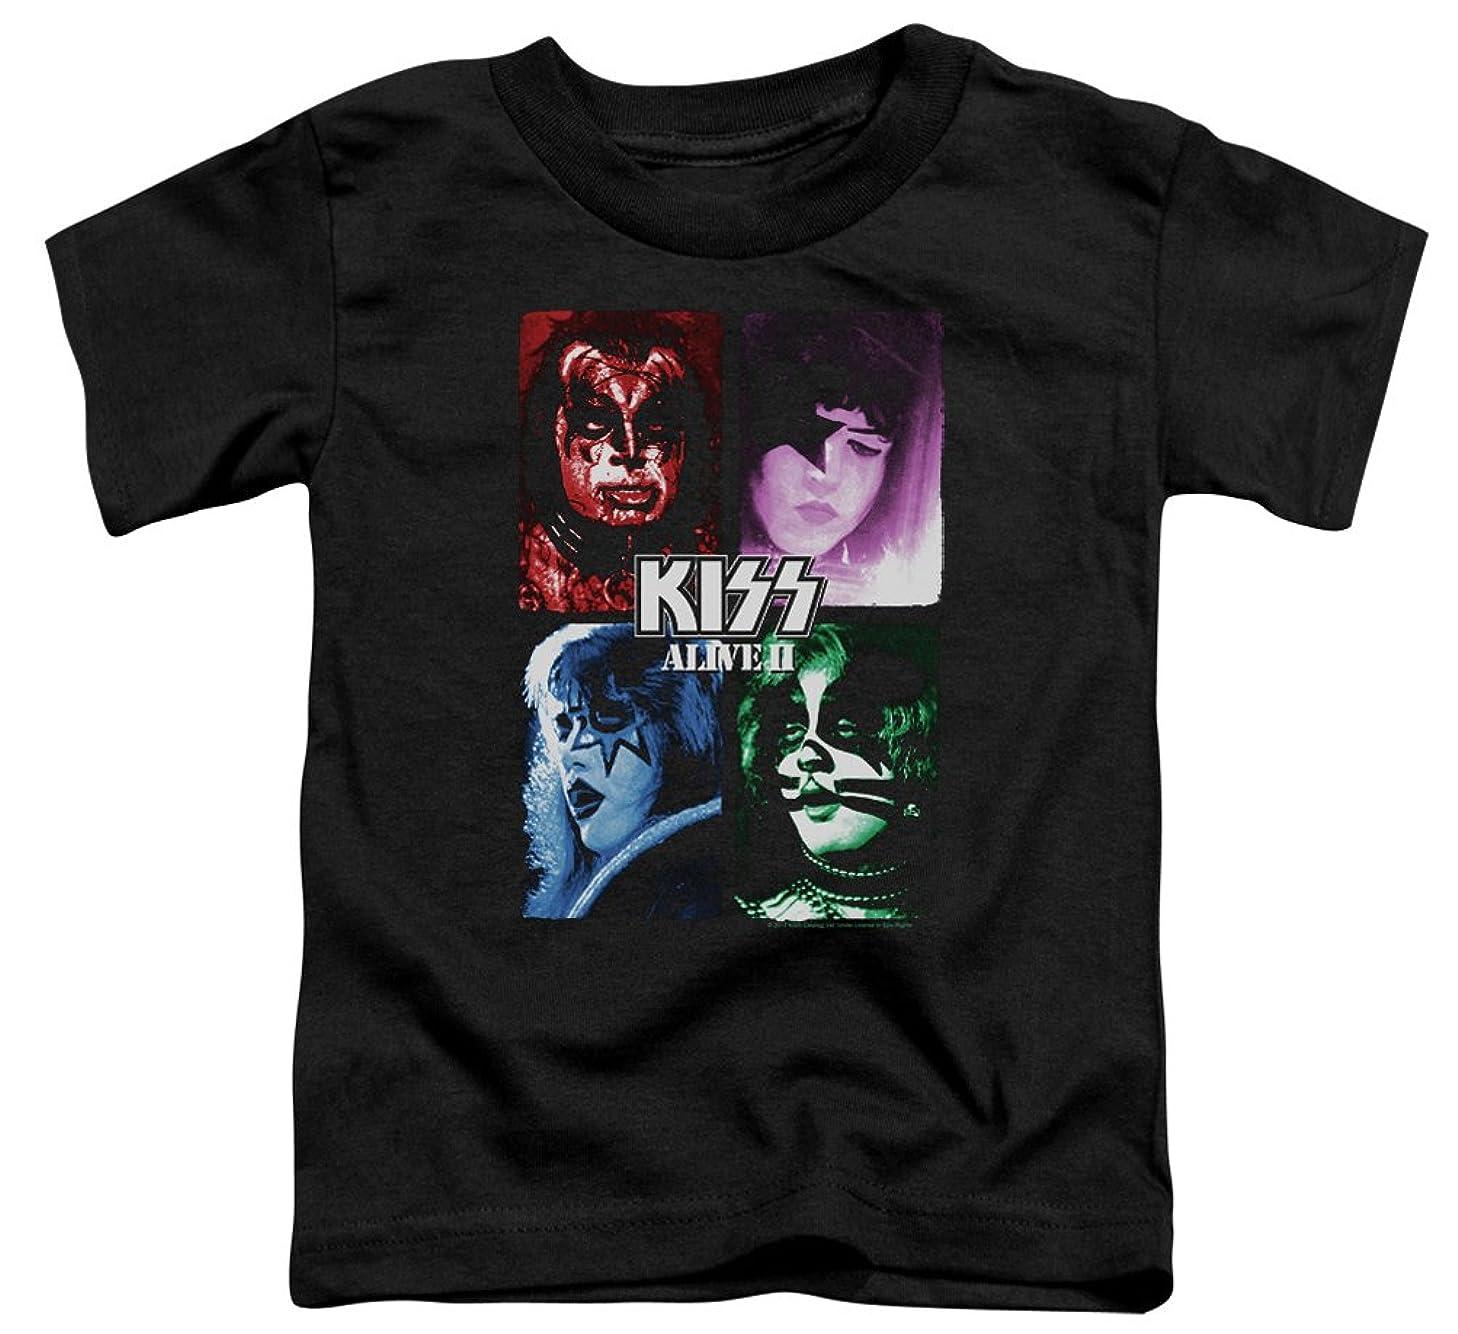 A&E Designs Kids KISS T-Shirt Alive II Cover Tee Shirt